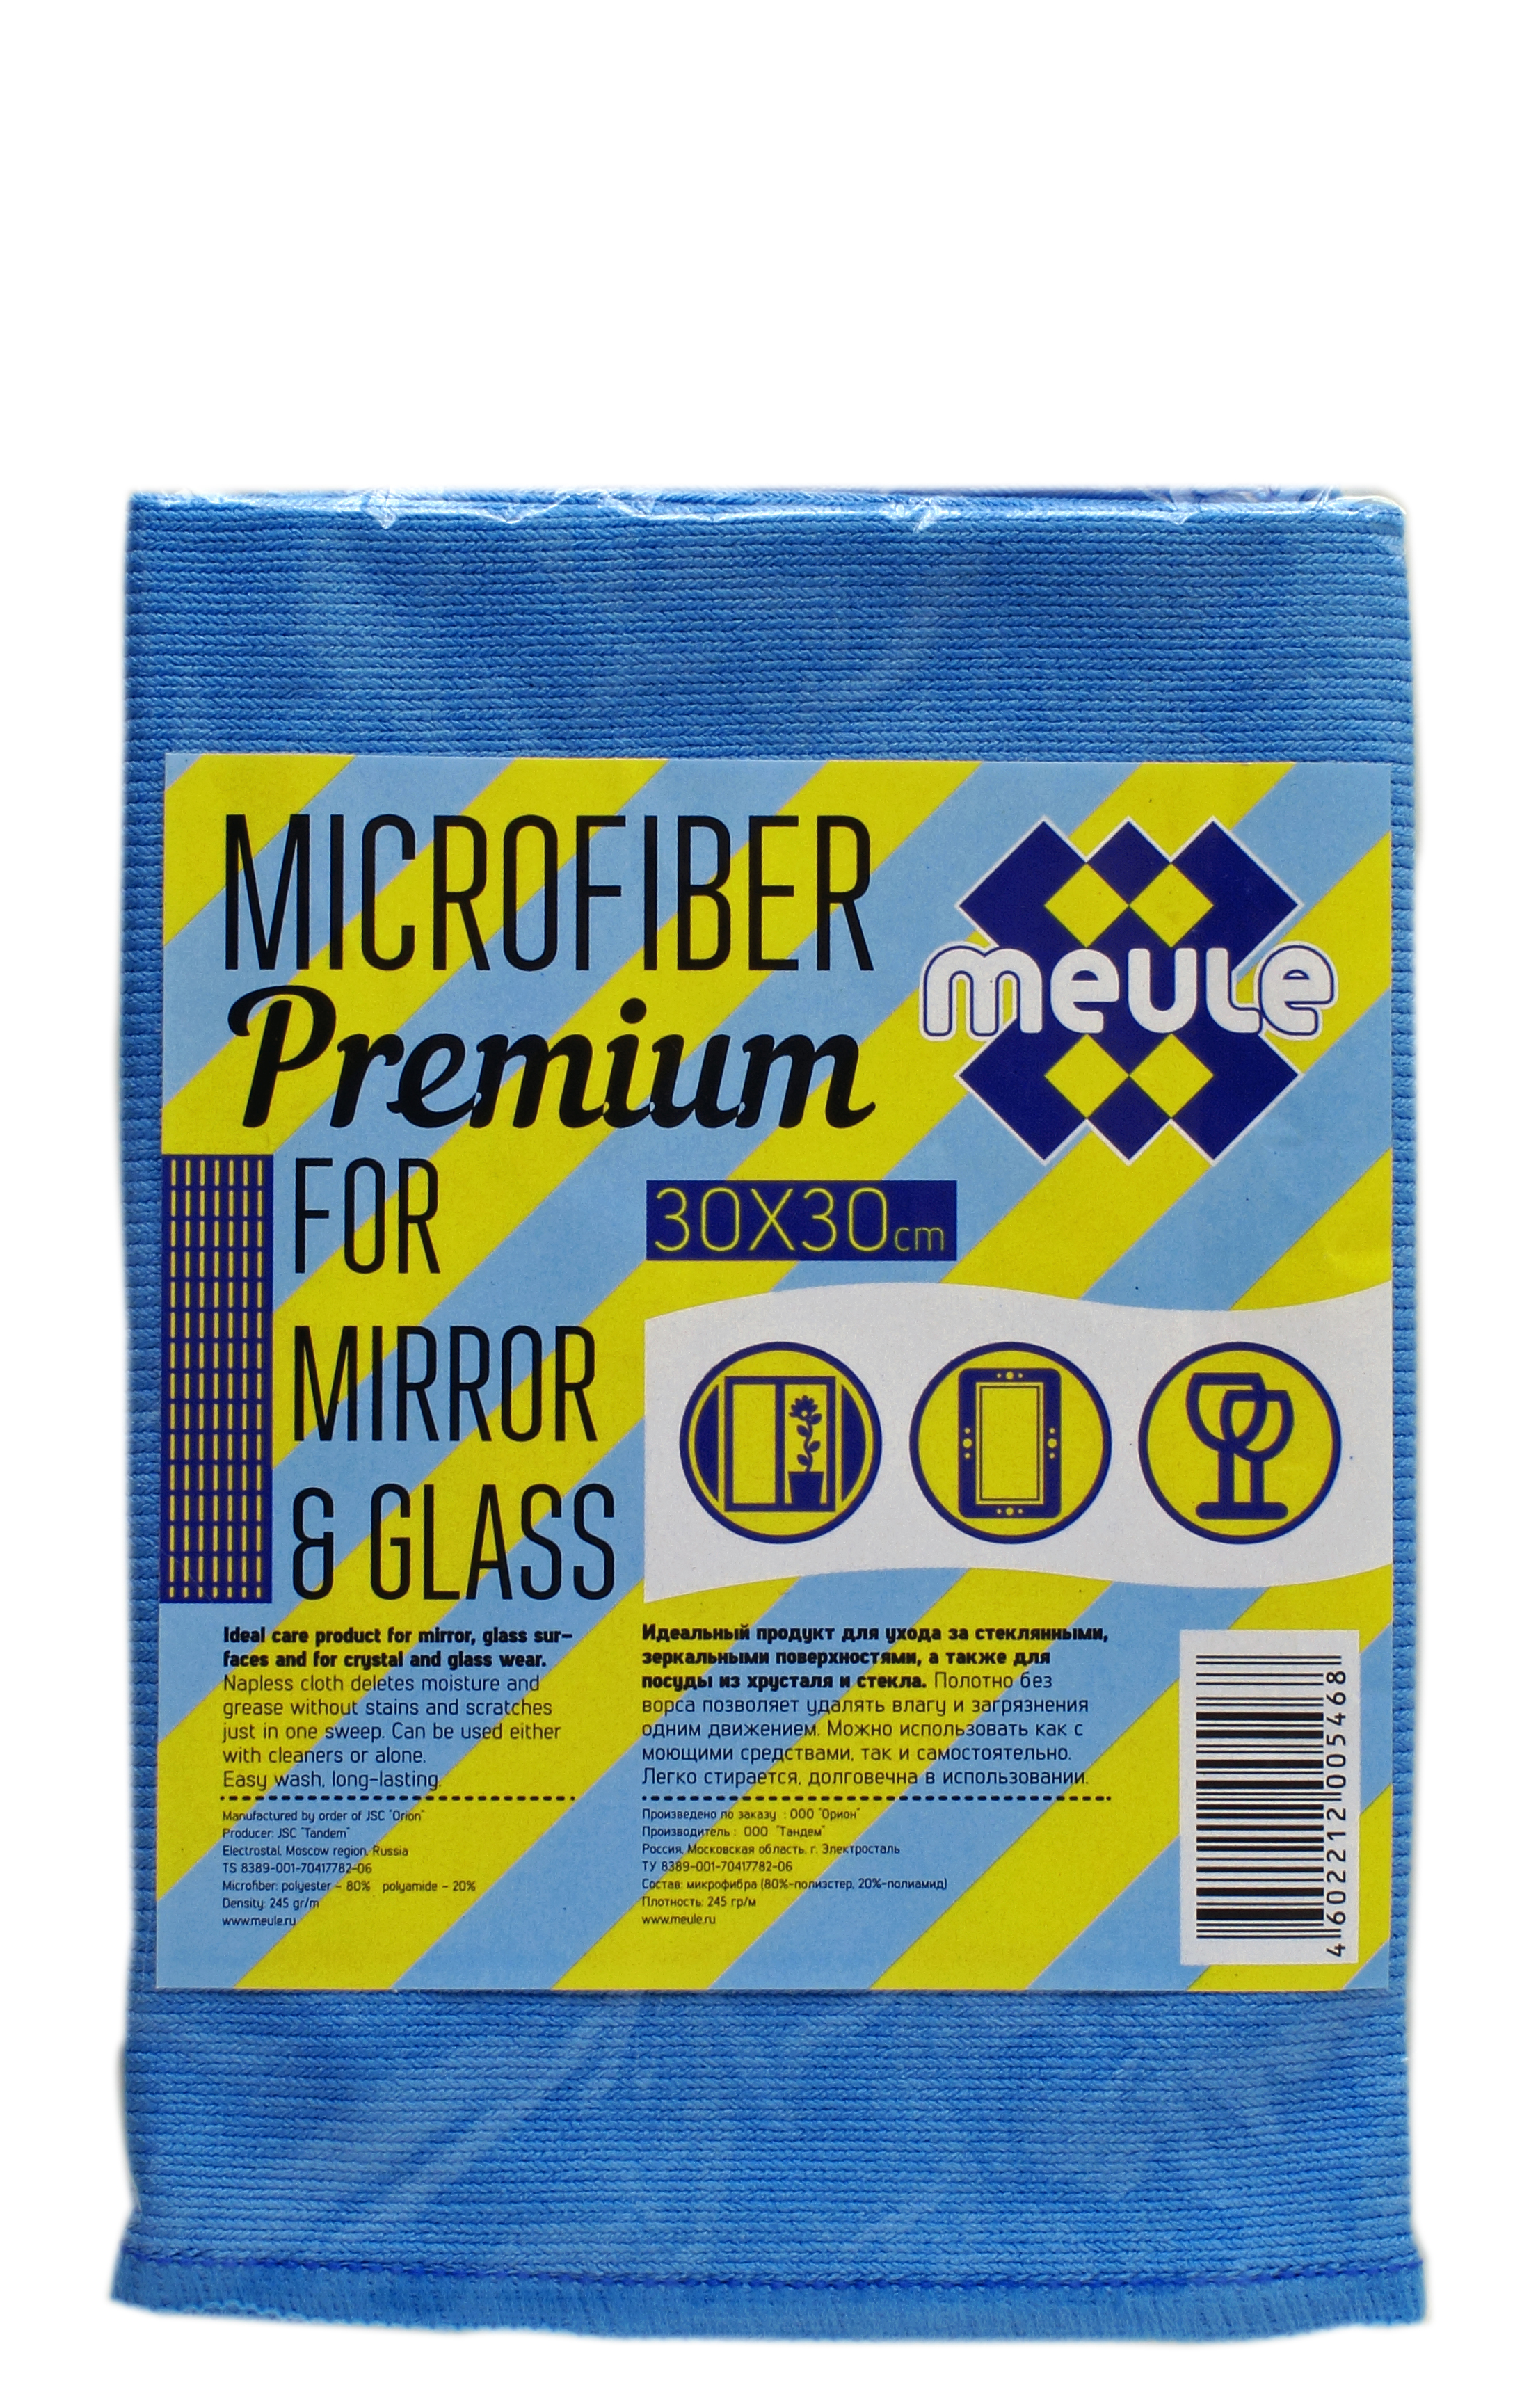 Салфетка Meule, для уборки стеклянных и зеркальных поверхностей, 30 х 30 см7900094602212005468 Meule 30x30cm. 260гр./м MICROFIBER. (PREMIUM FOR MIRROR@GLASS 30x30) Салфетка из микрофибры для уборки стеклянных и зеркальных поверхностей 1/40